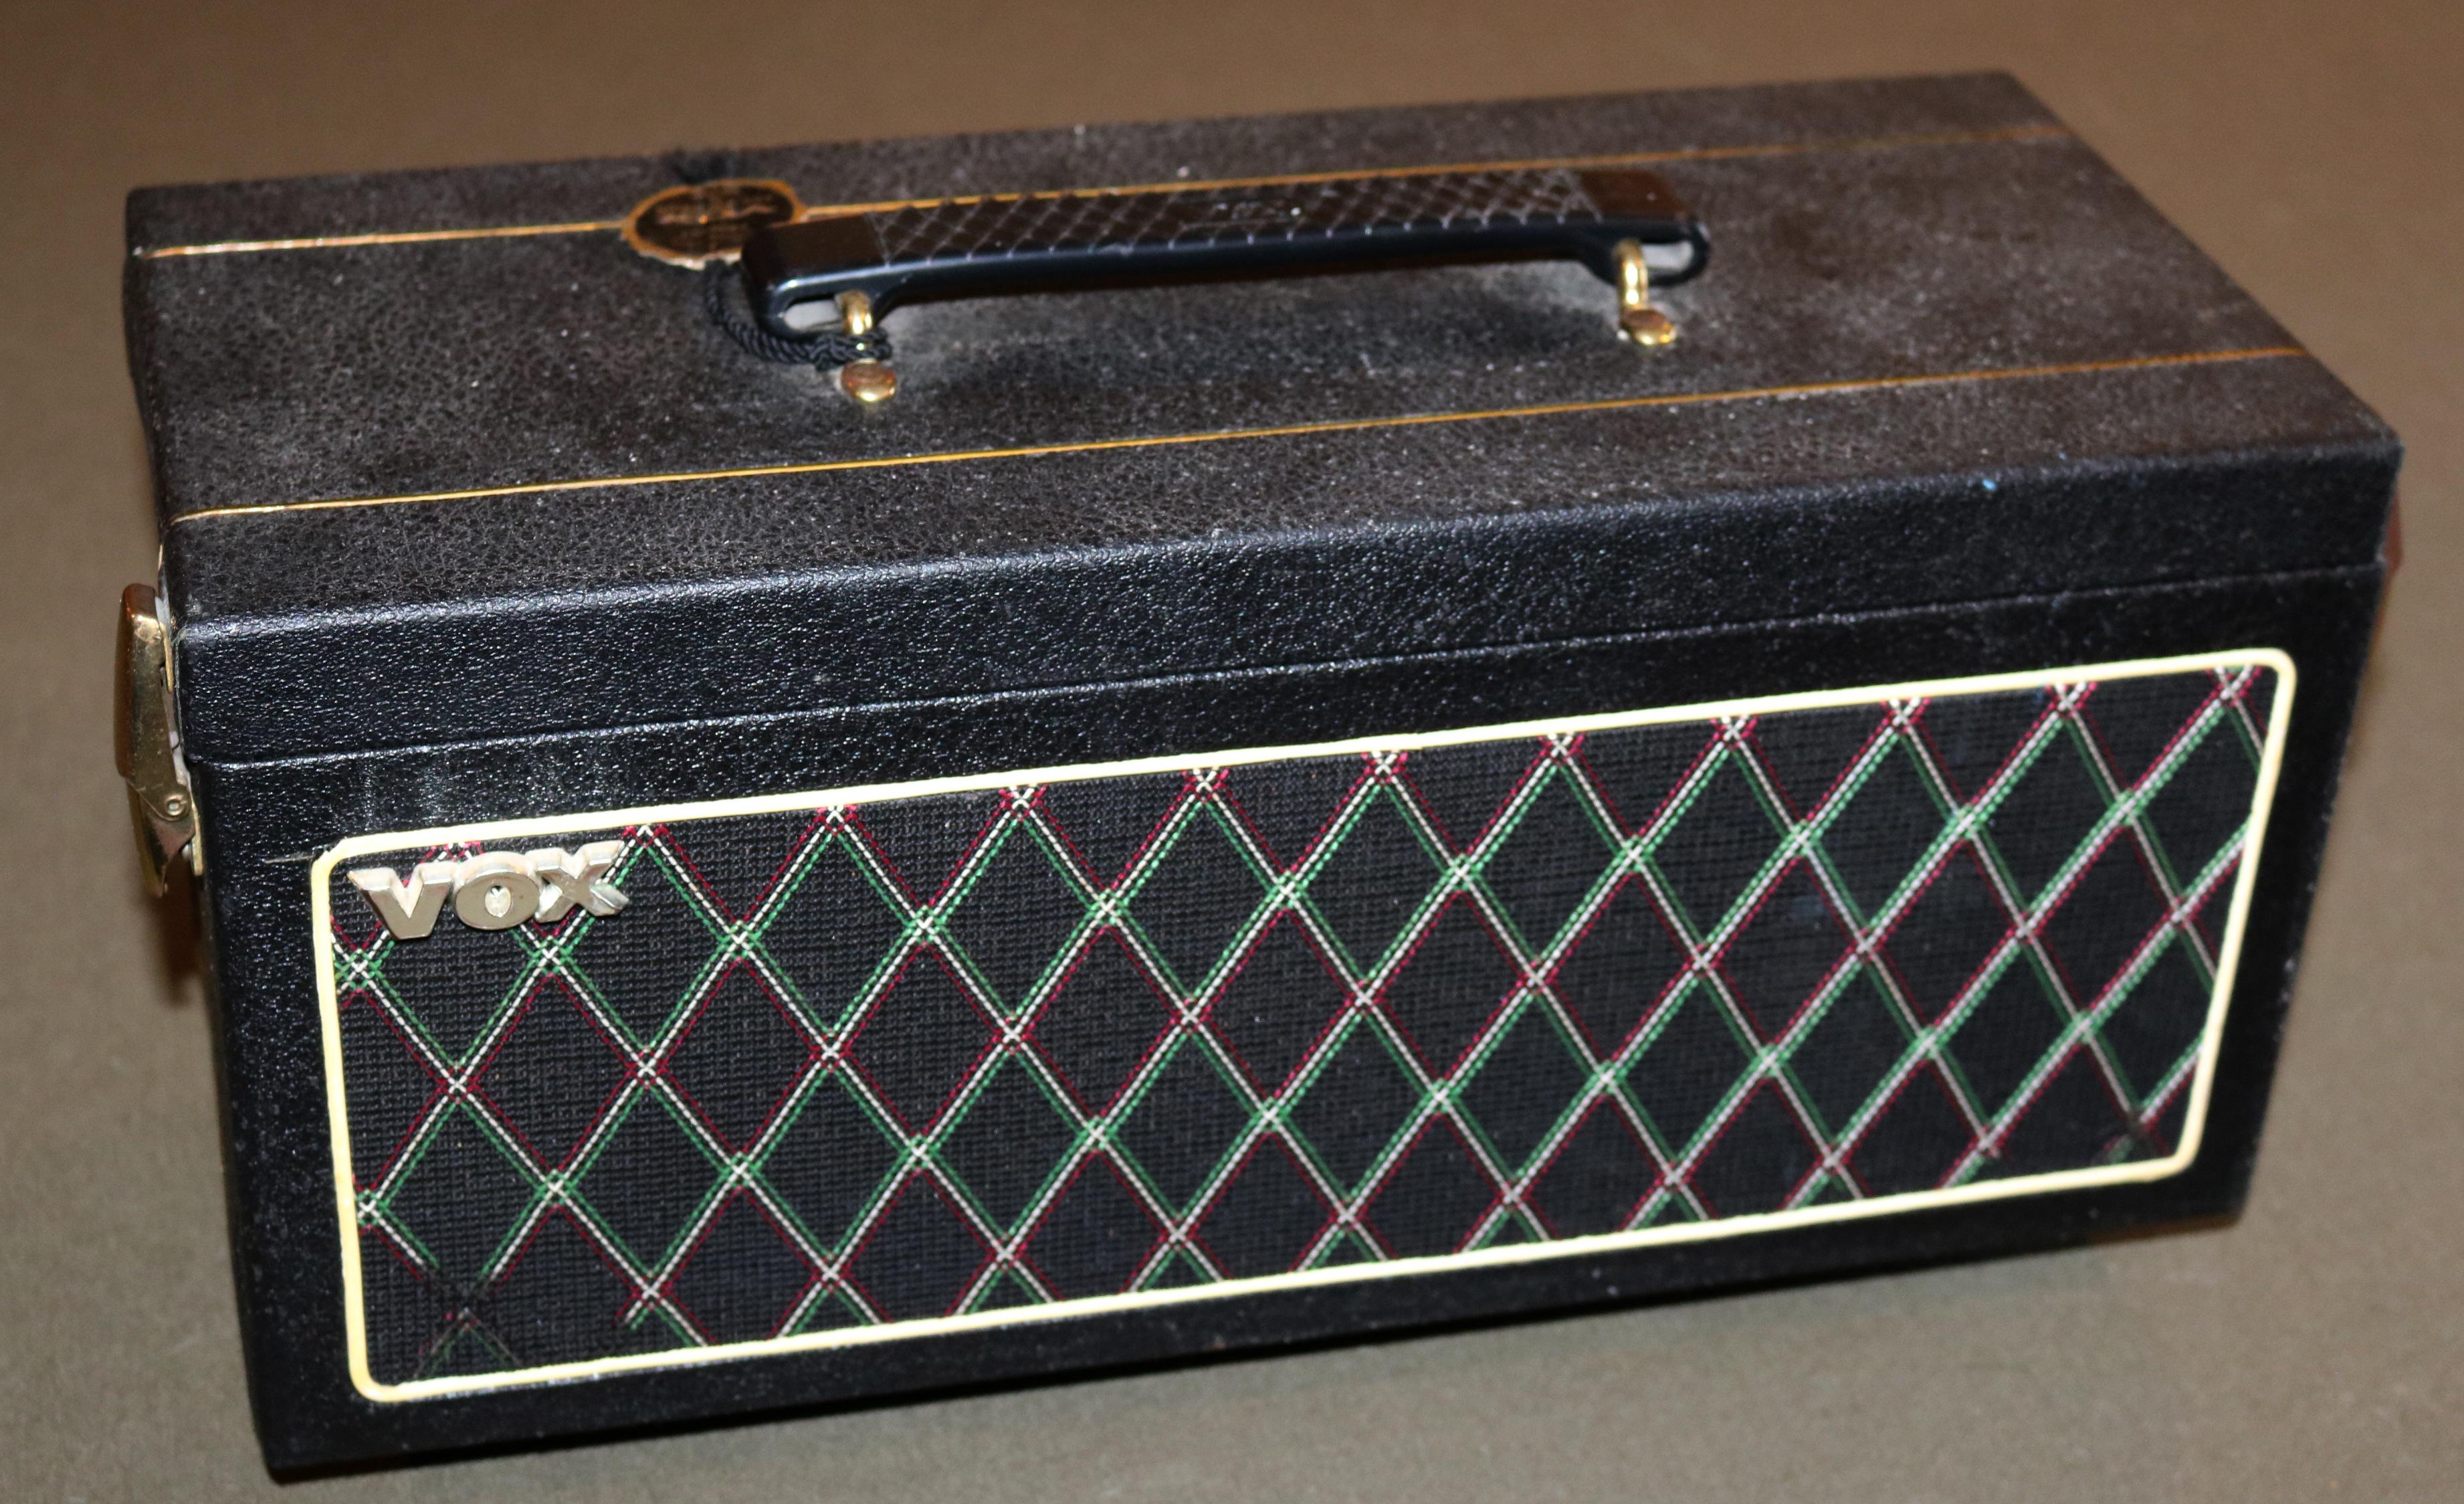 1967 Vox Percussion King Analog Drum Machine Garys